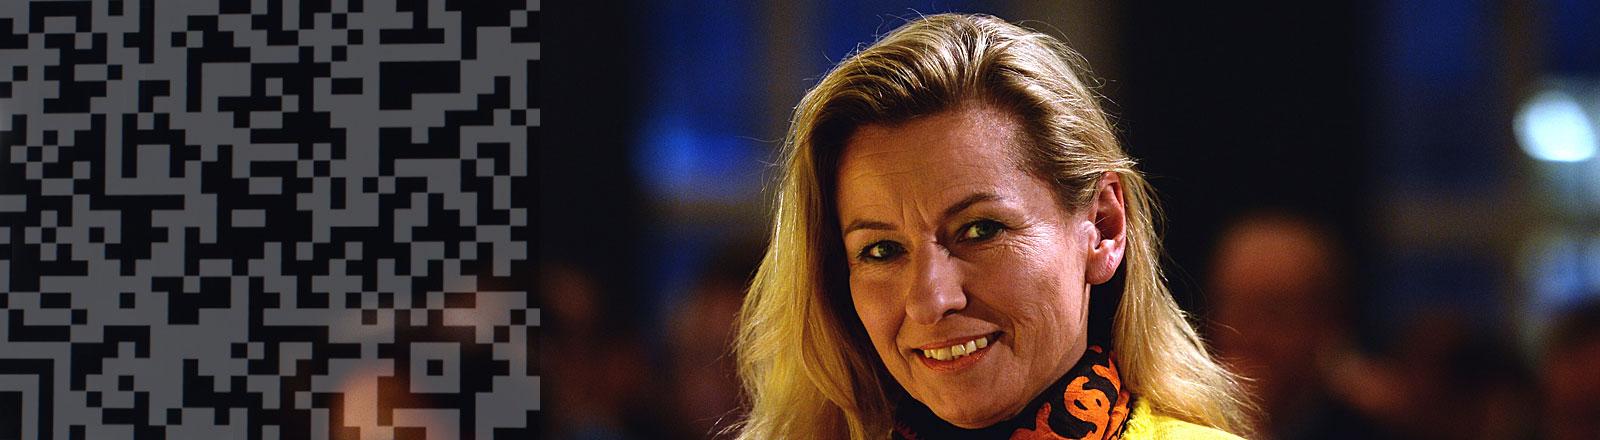 Alexandra Thein, FDP-Politikerin, links im Bild QR-Code als Overlay